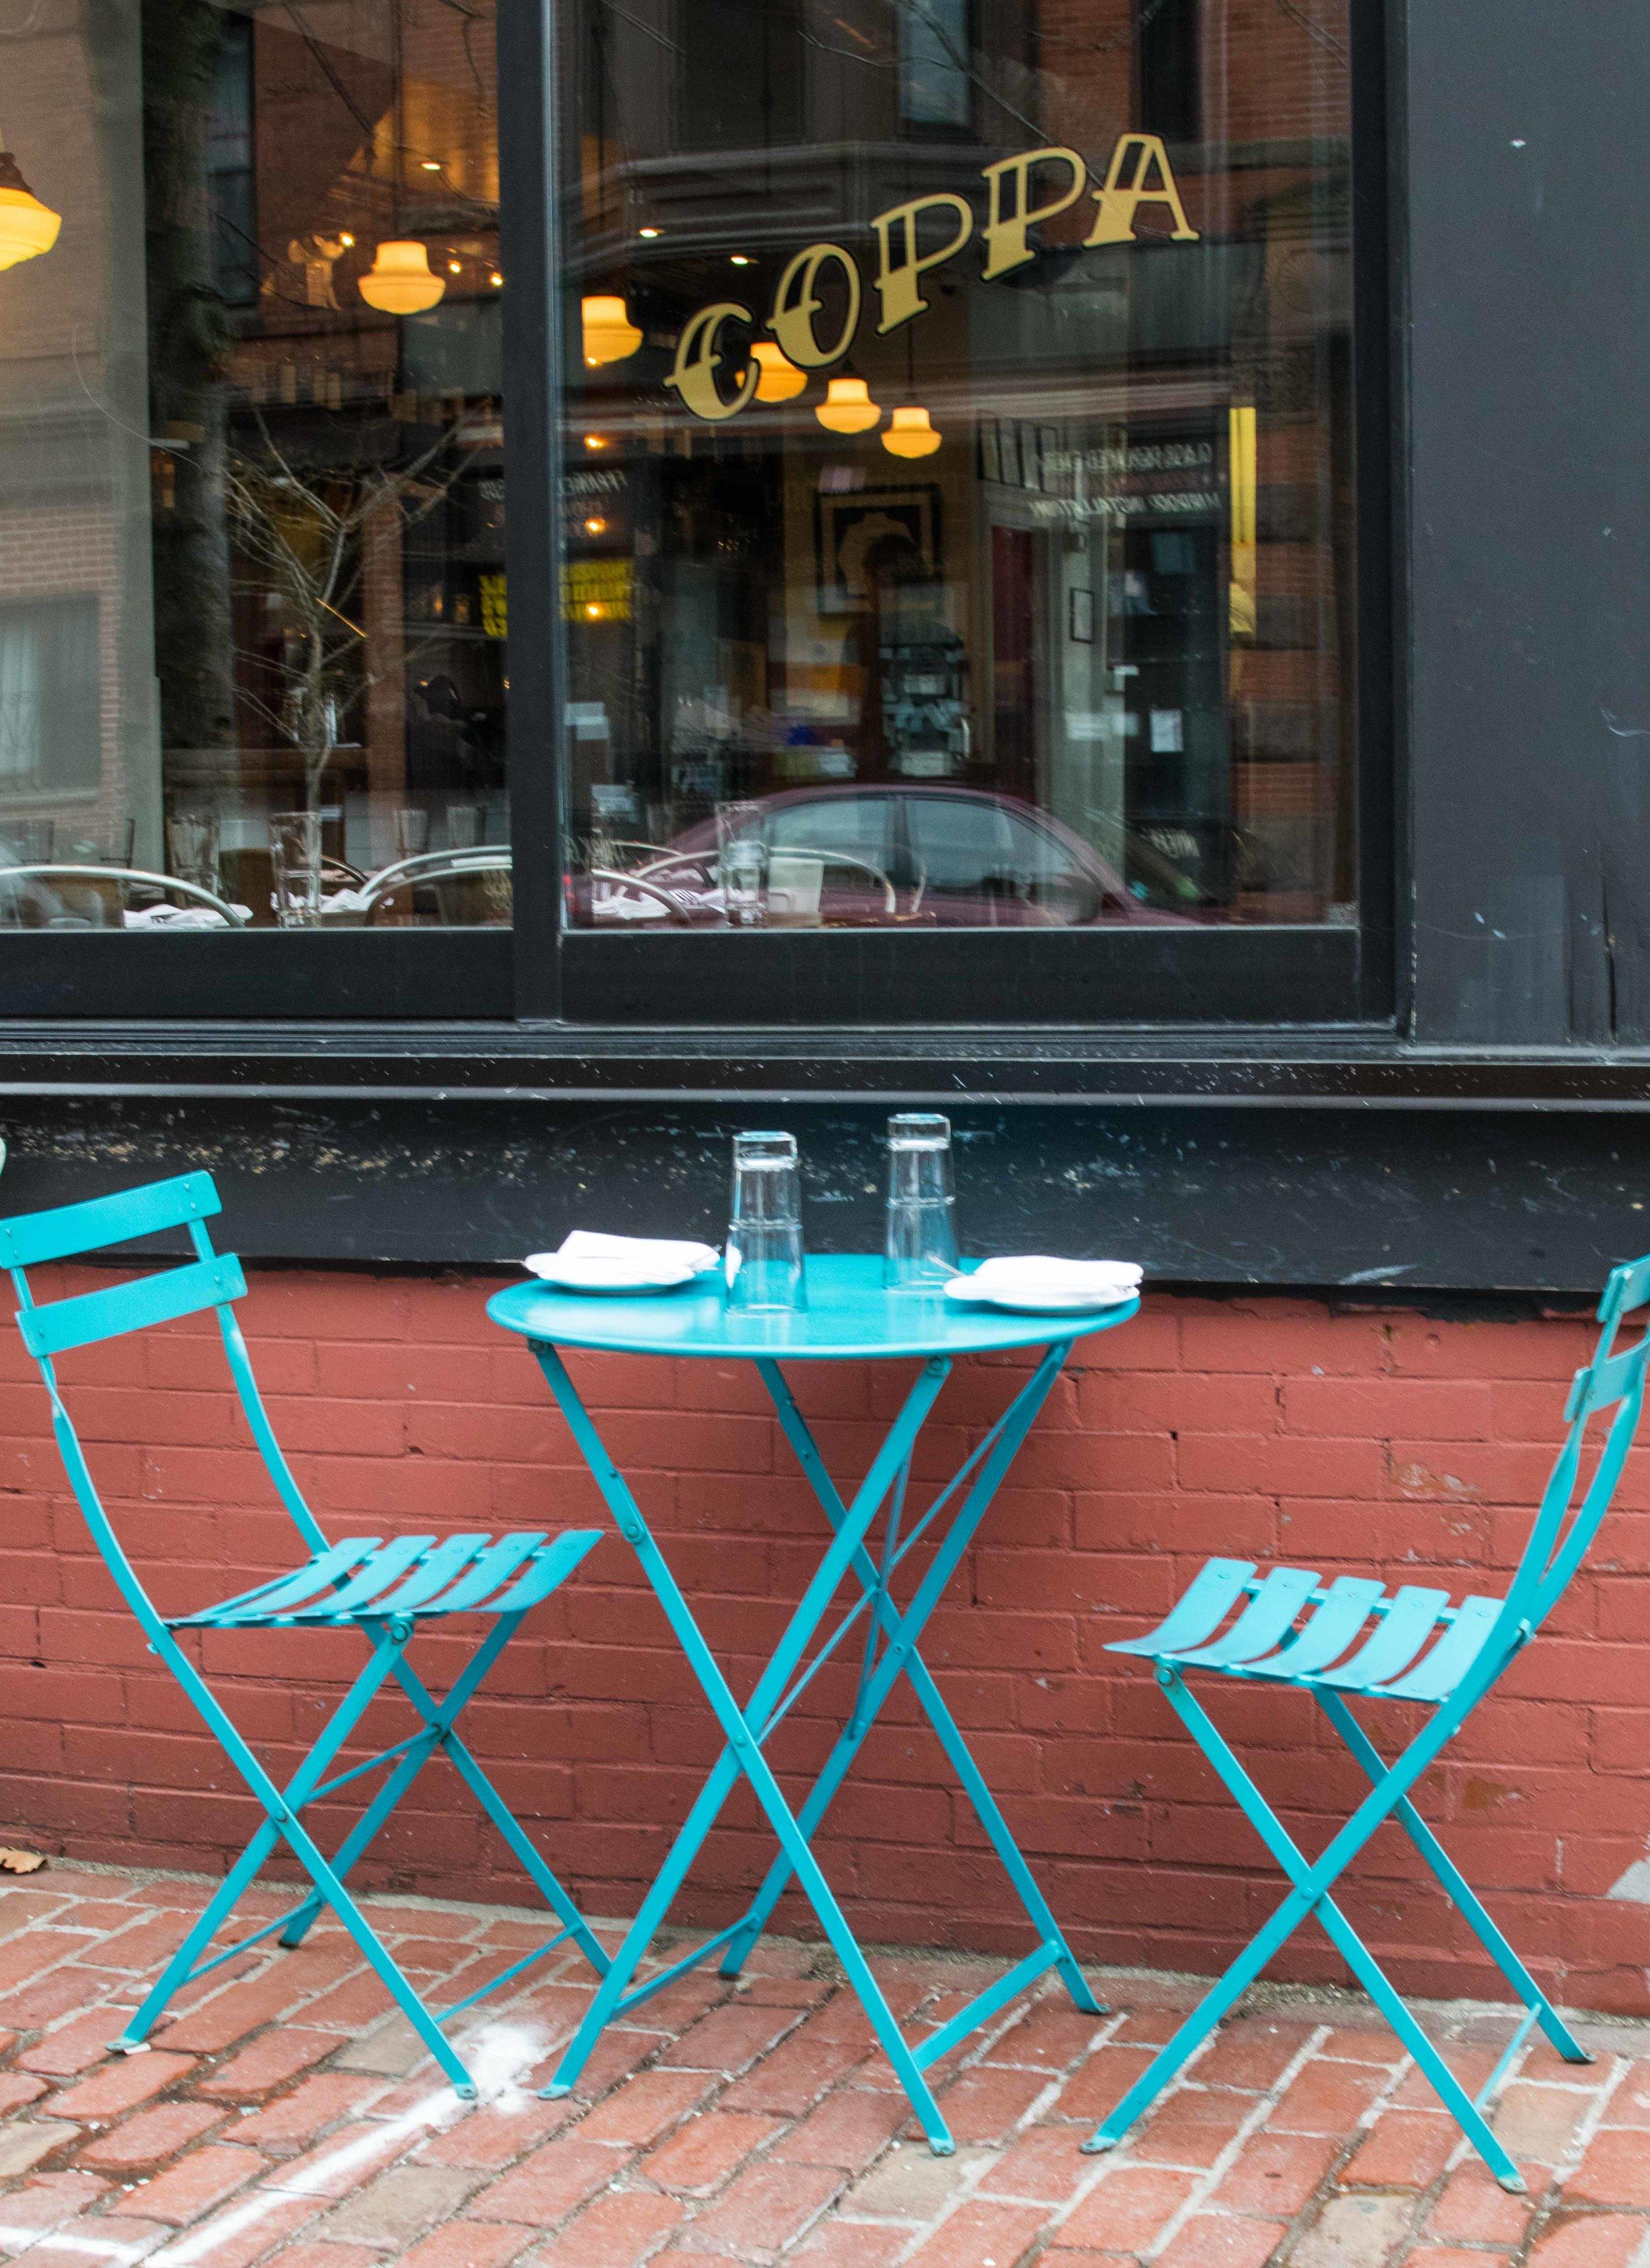 coppa_patio_blue_tables3.jpg